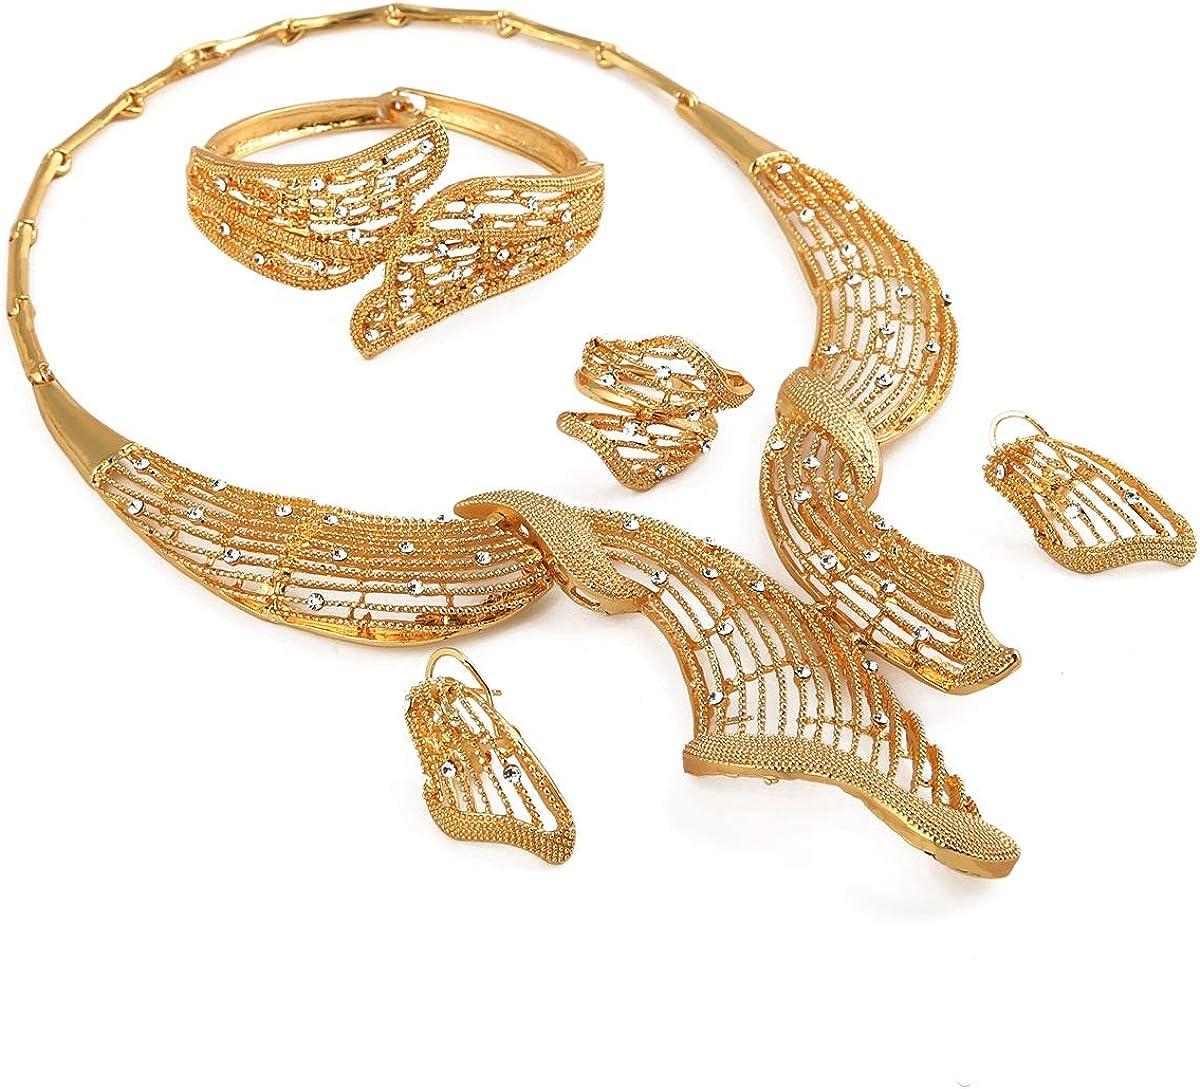 24K Gold Plated Jewelry Set White Stone Choker Jewelry Set Habesha Eritrea